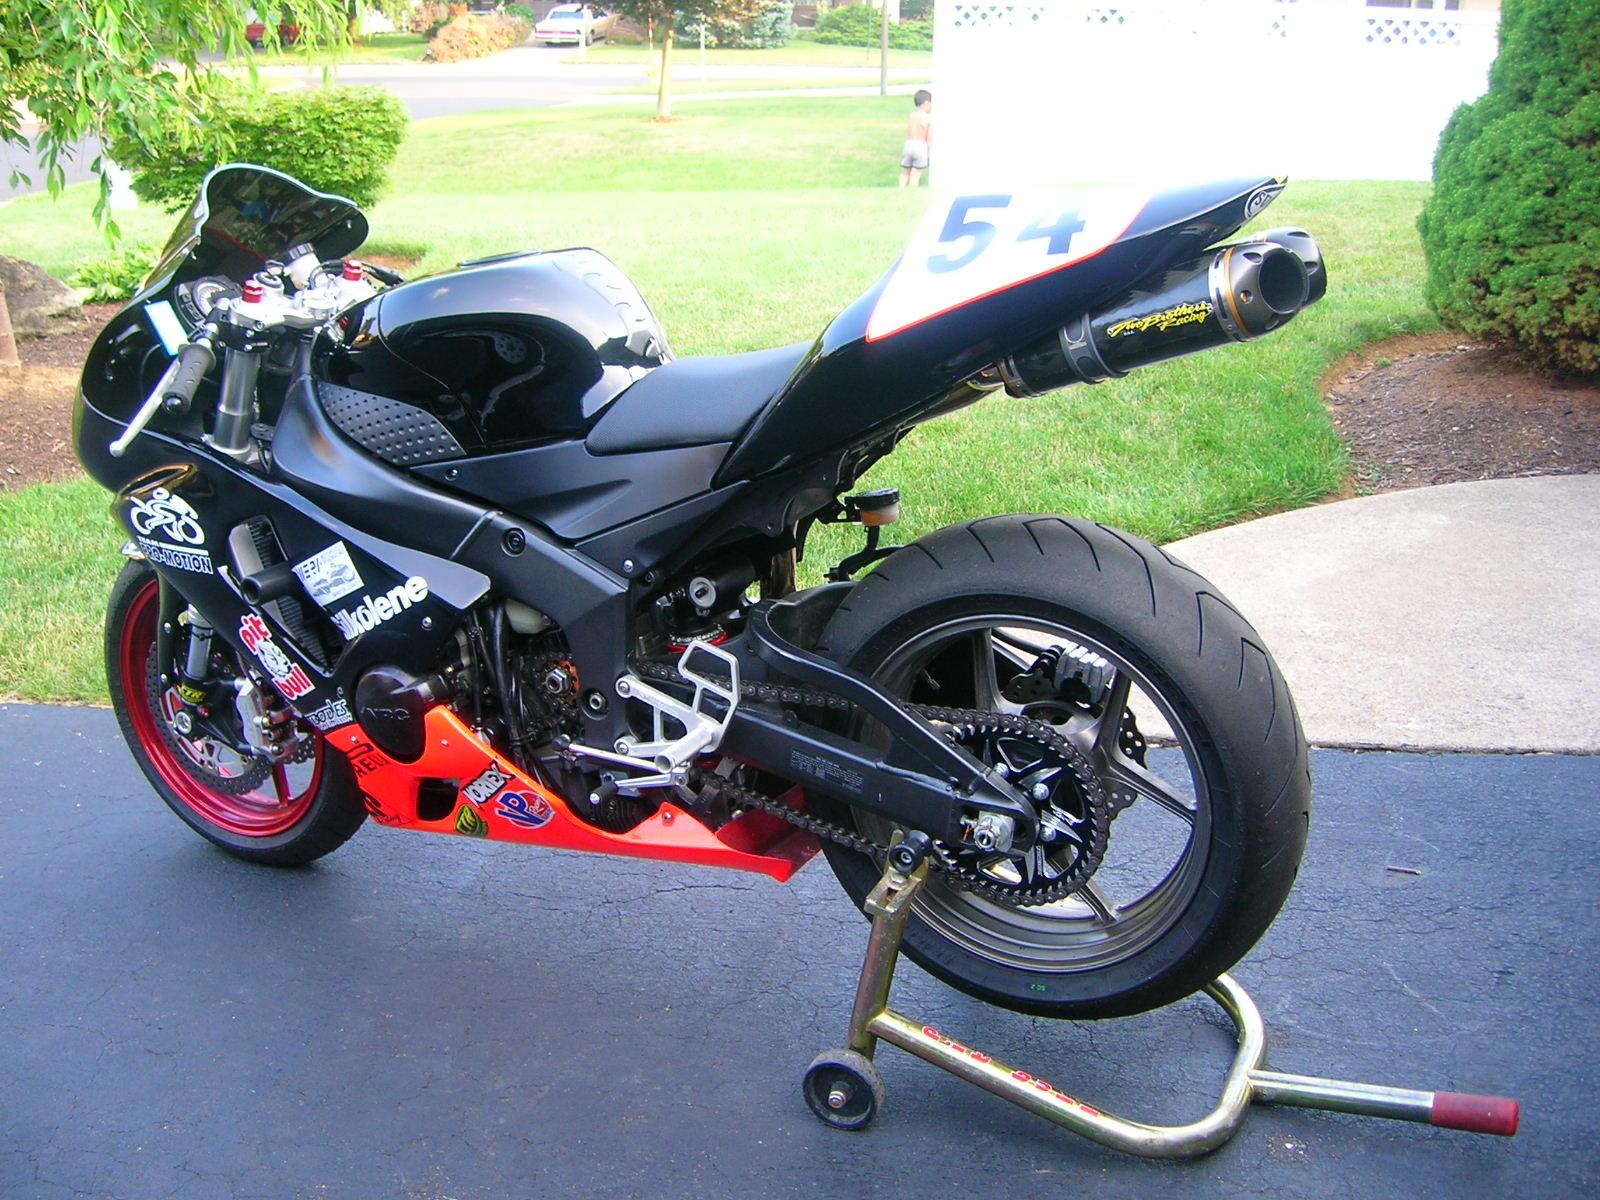 2006 kawasaki 636 race/tarck bike for sale - sportbikes